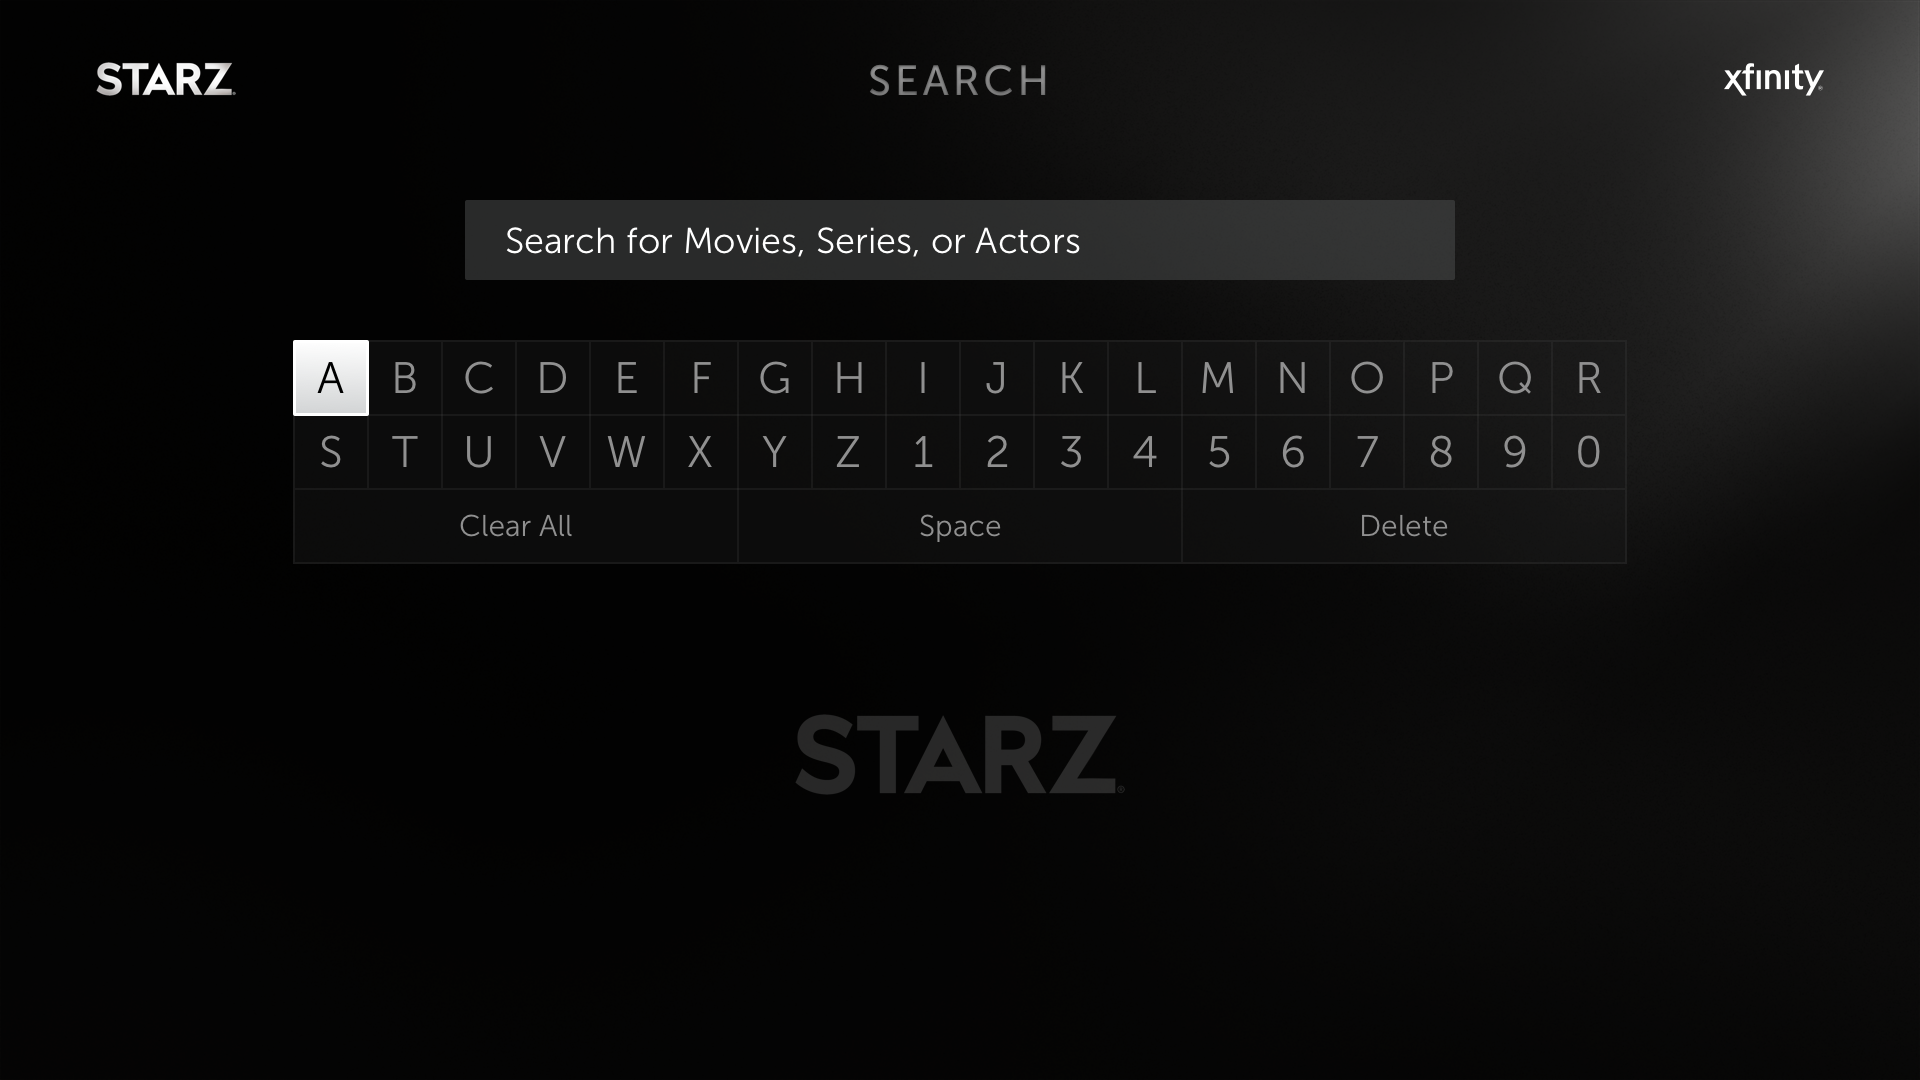 STARZ custom Search keyboard - the final result.